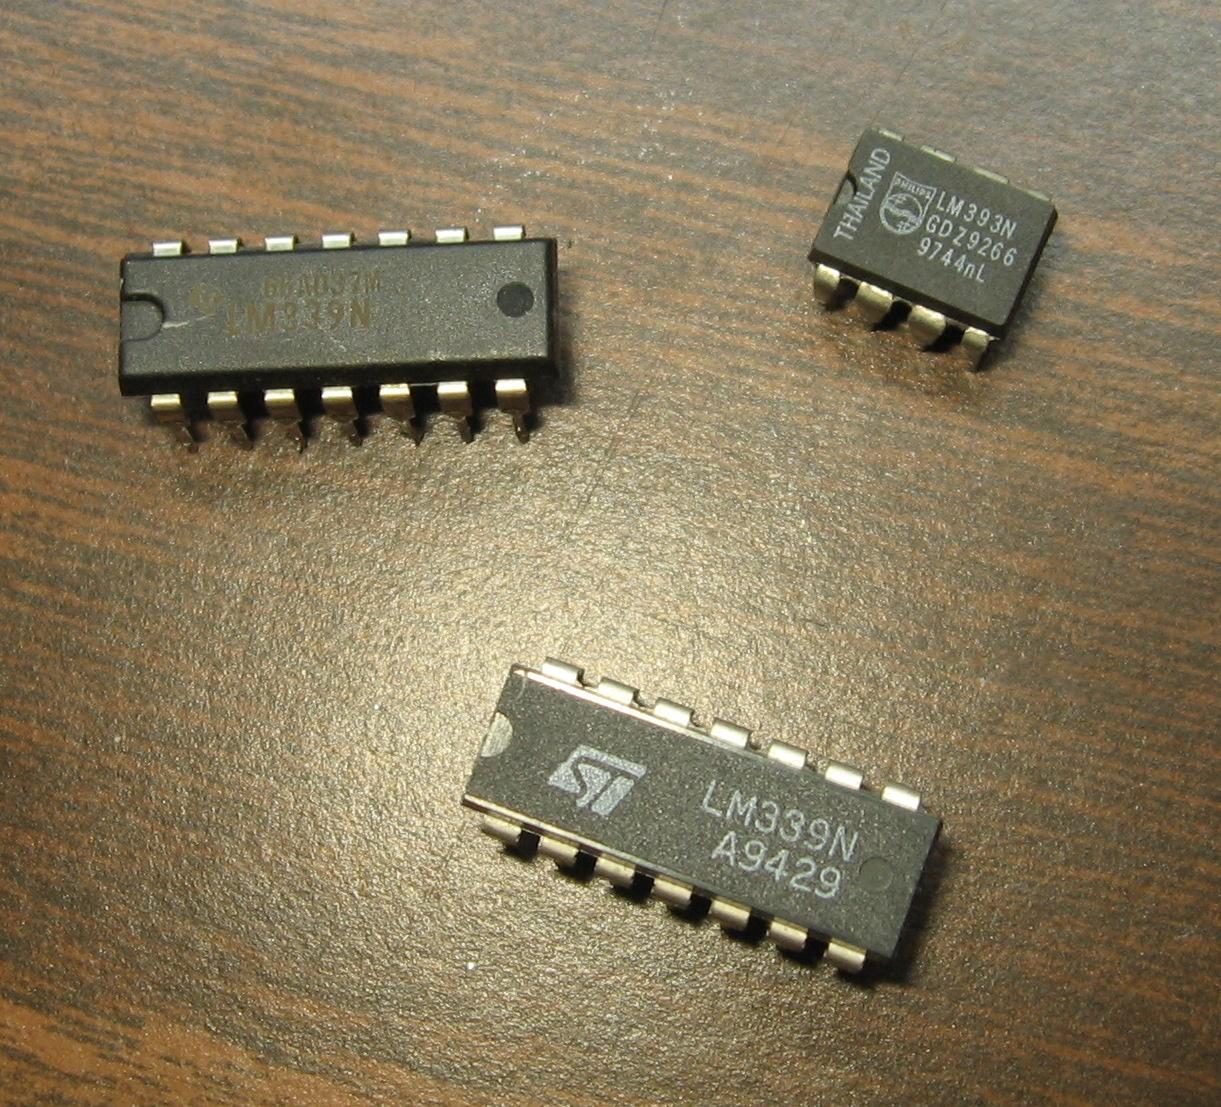 1 Resistors Drawing Circuit Diagram License Lgpl Electronic Projects Circuits Filecomparators Stuuf Source